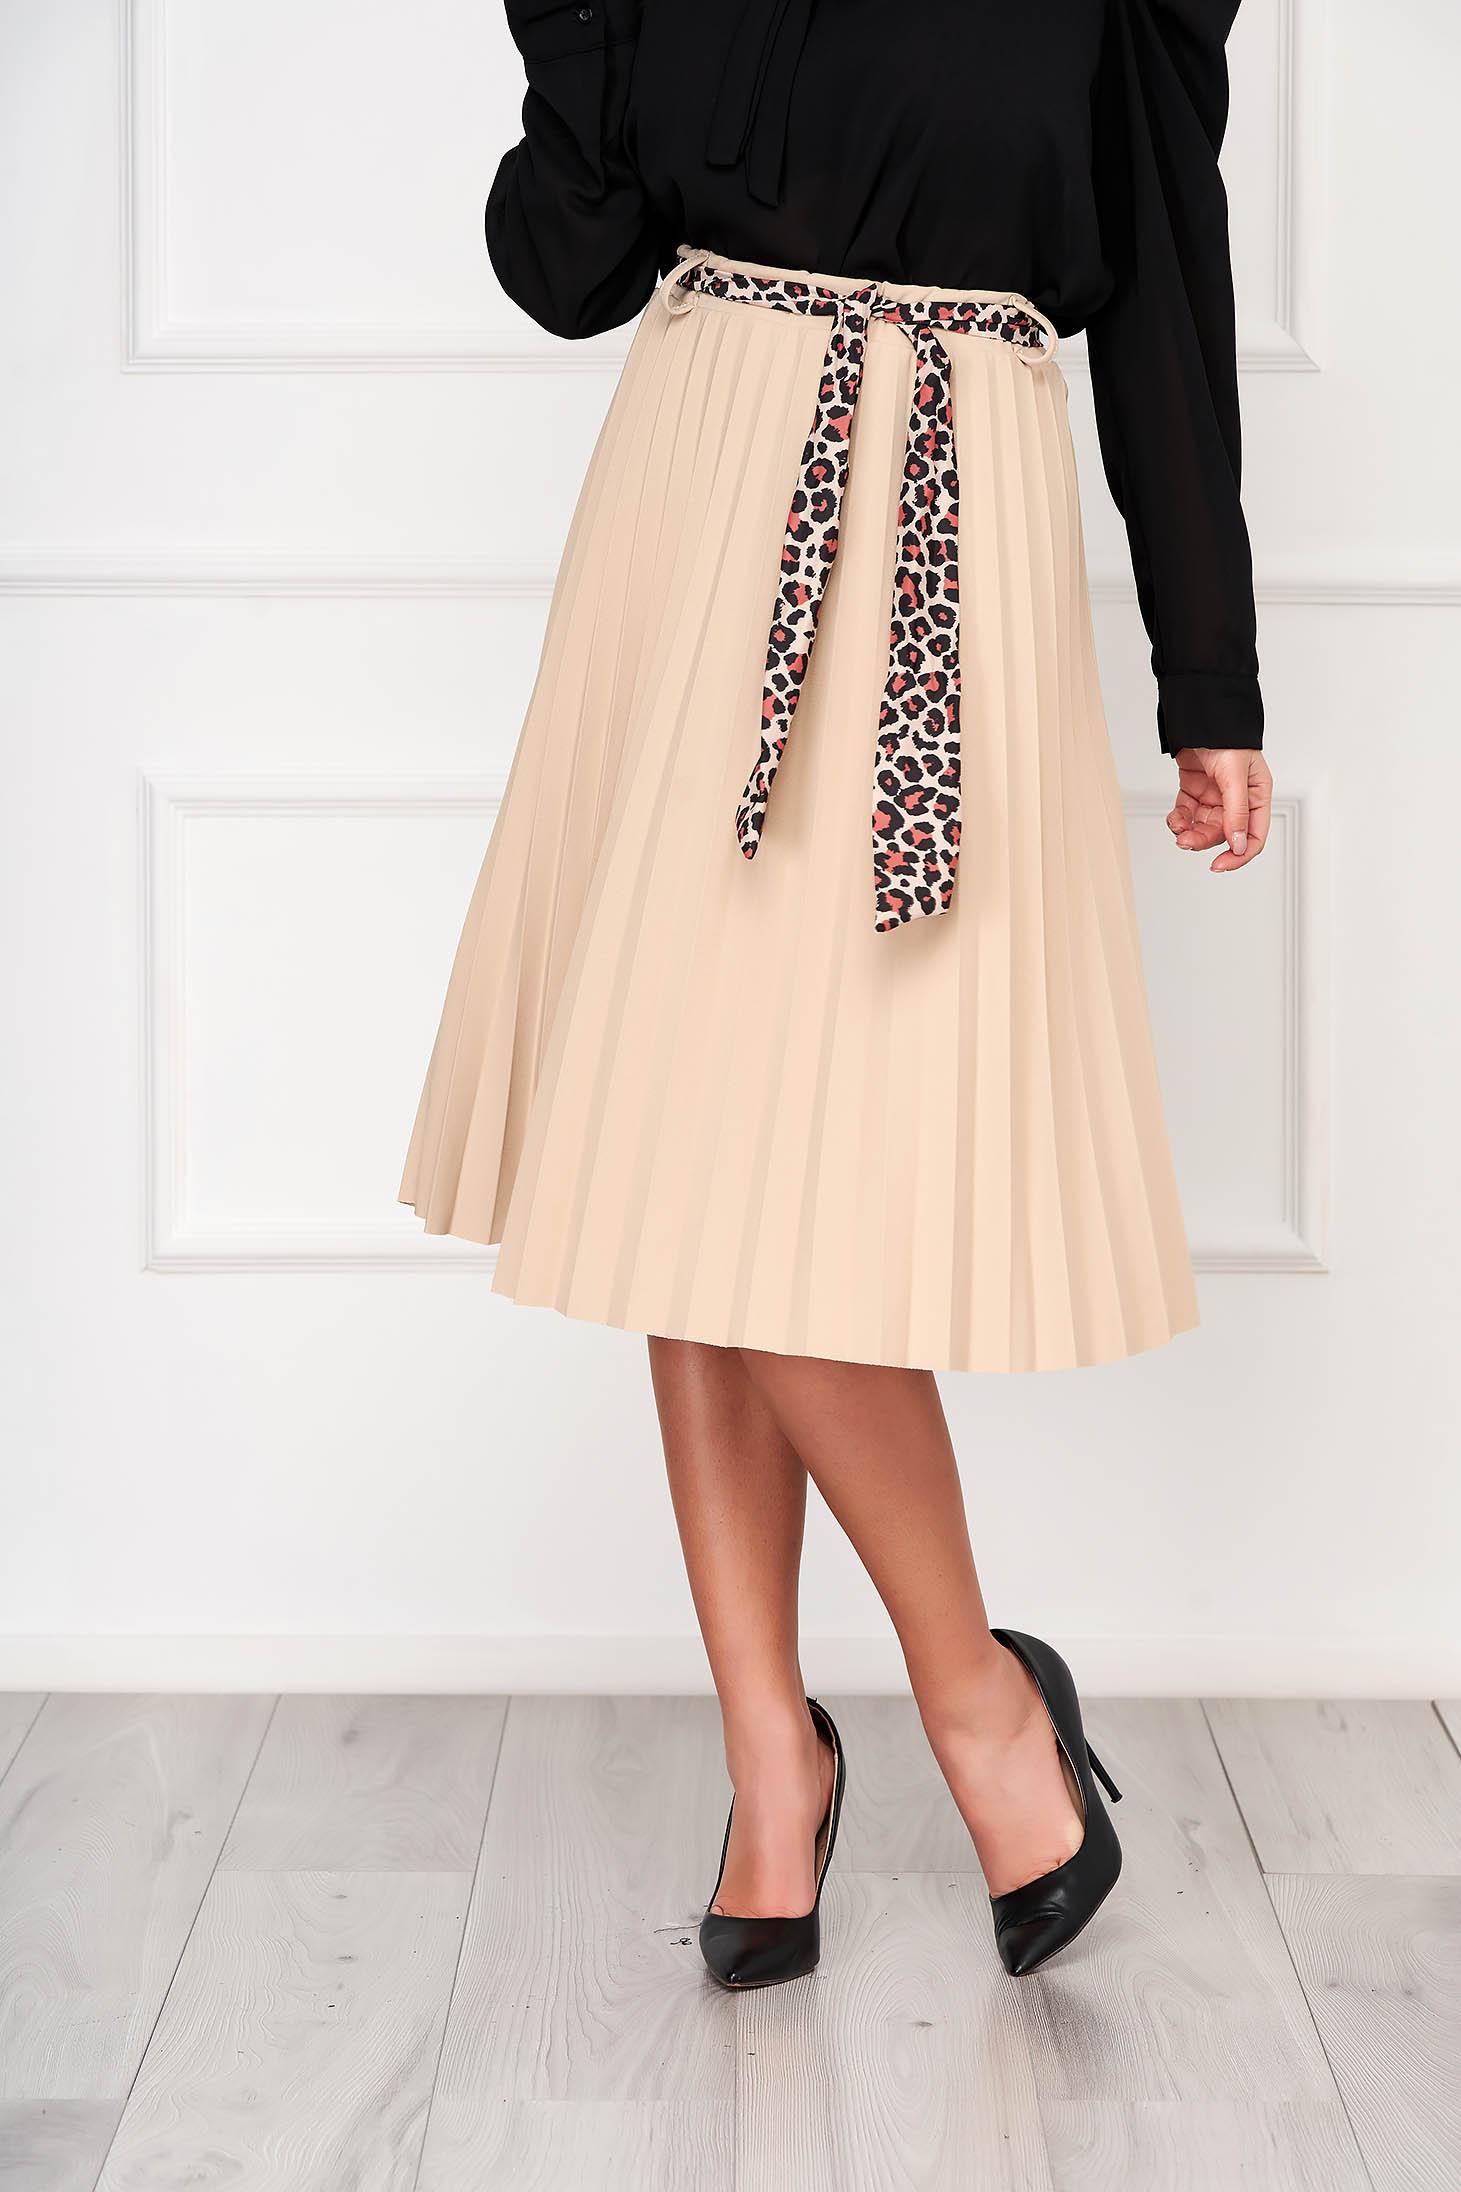 Cream casual midi cloche skirt accessorized with belt pleats of material